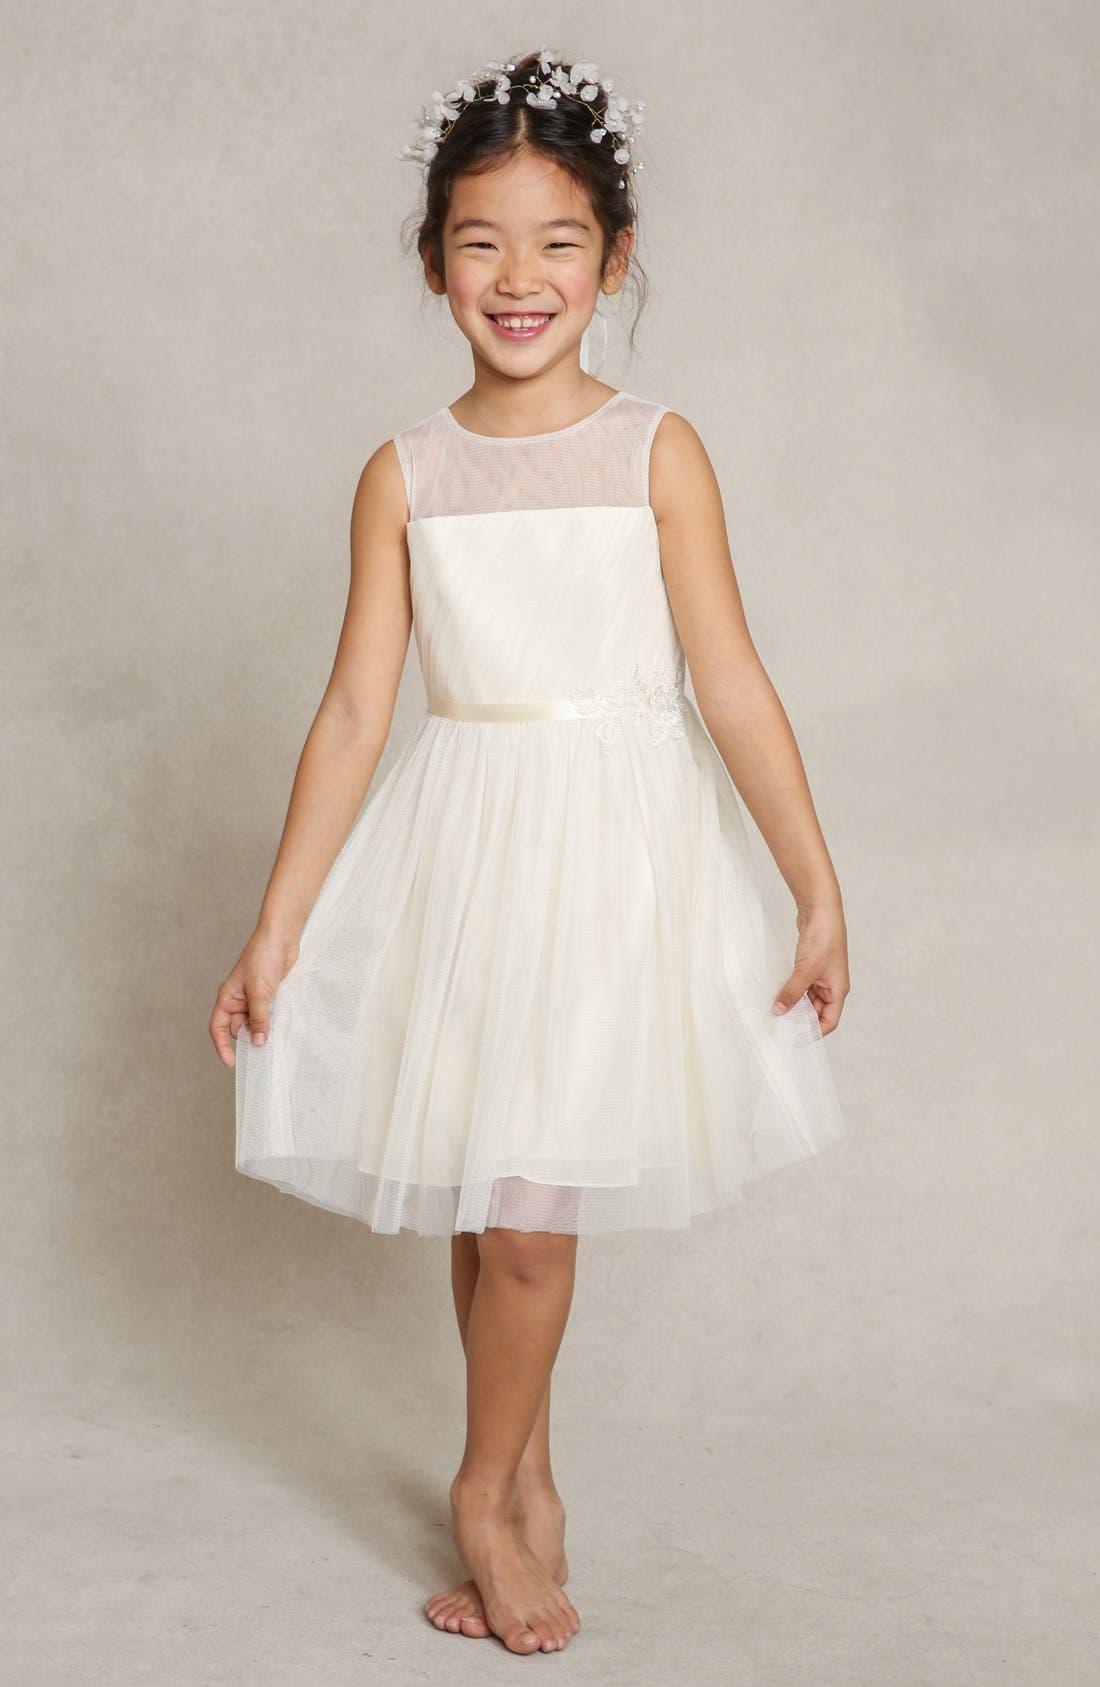 Alternate Image 1 Selected - Jenny Yoo 'Zoe' Floral Appliqué Tulle Dress (Toddler, Little Girls & Big Girls)